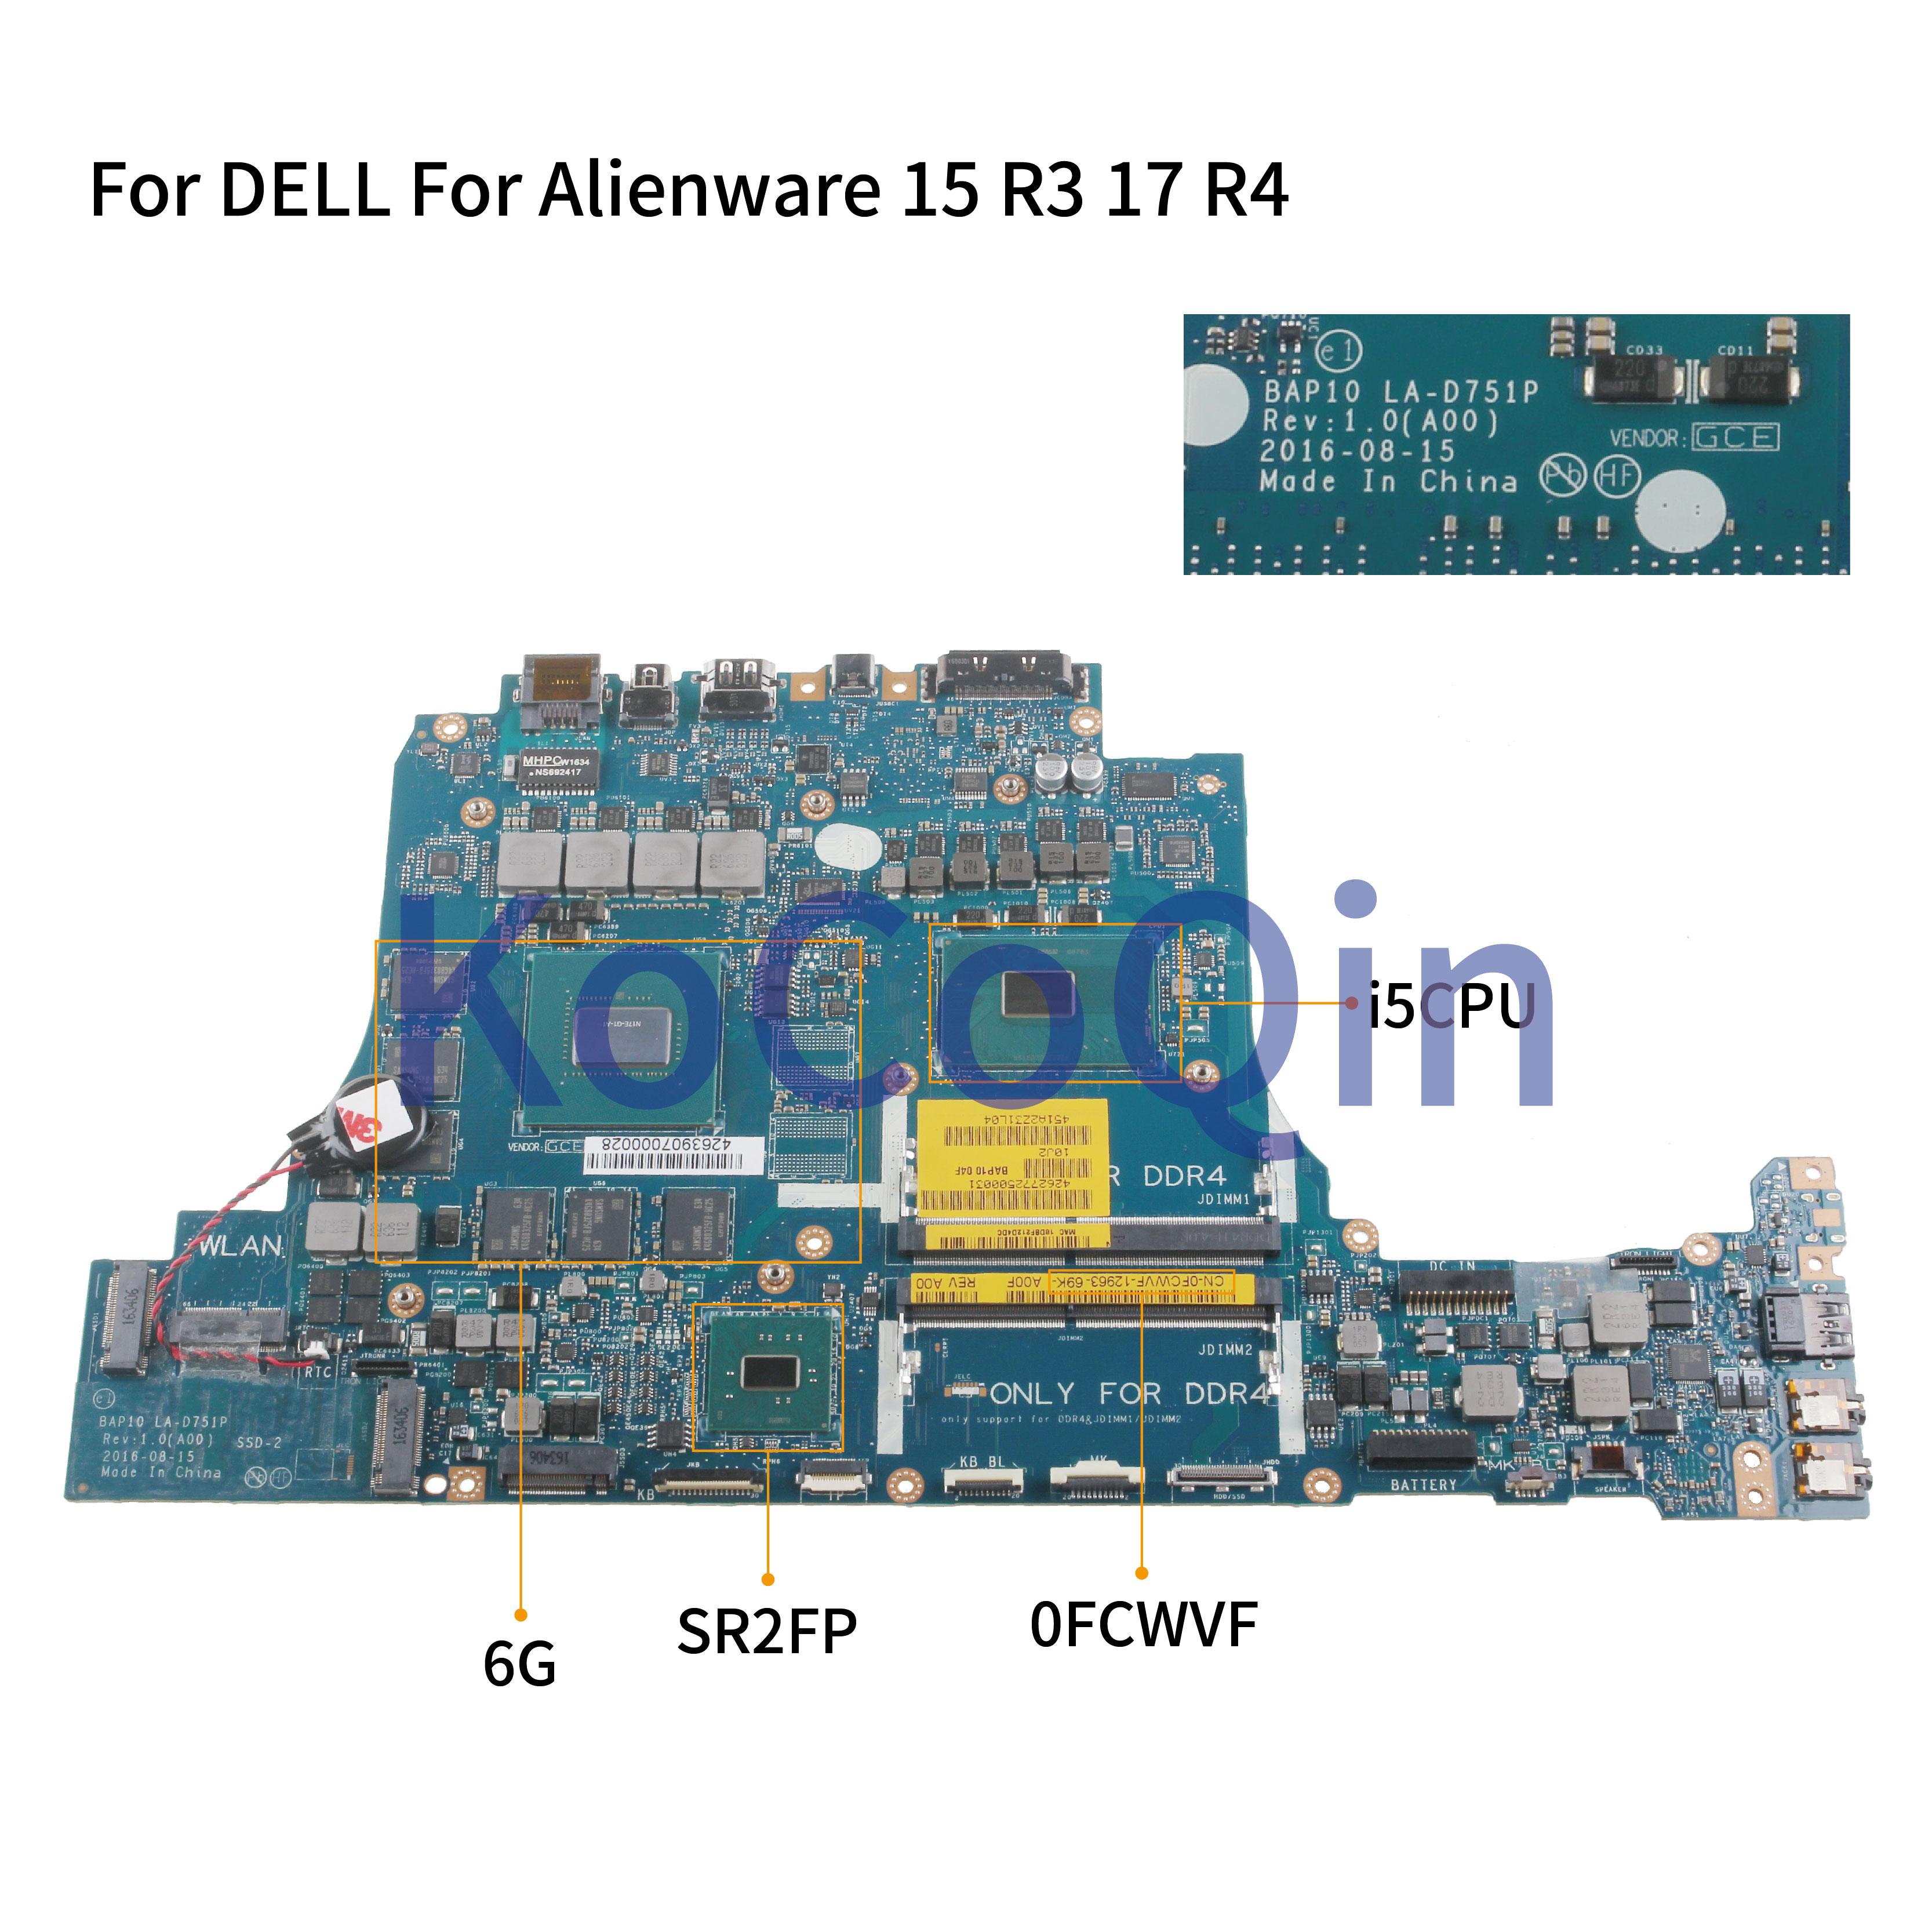 KoCoQin para dell Alienware 15 R3 17 R4 BAPLA-D751P placa base CN-0FCWVF 0FCWVF i5-6300HQ CPU N17E-G1-A1 6G VRAM SR2FP placa base